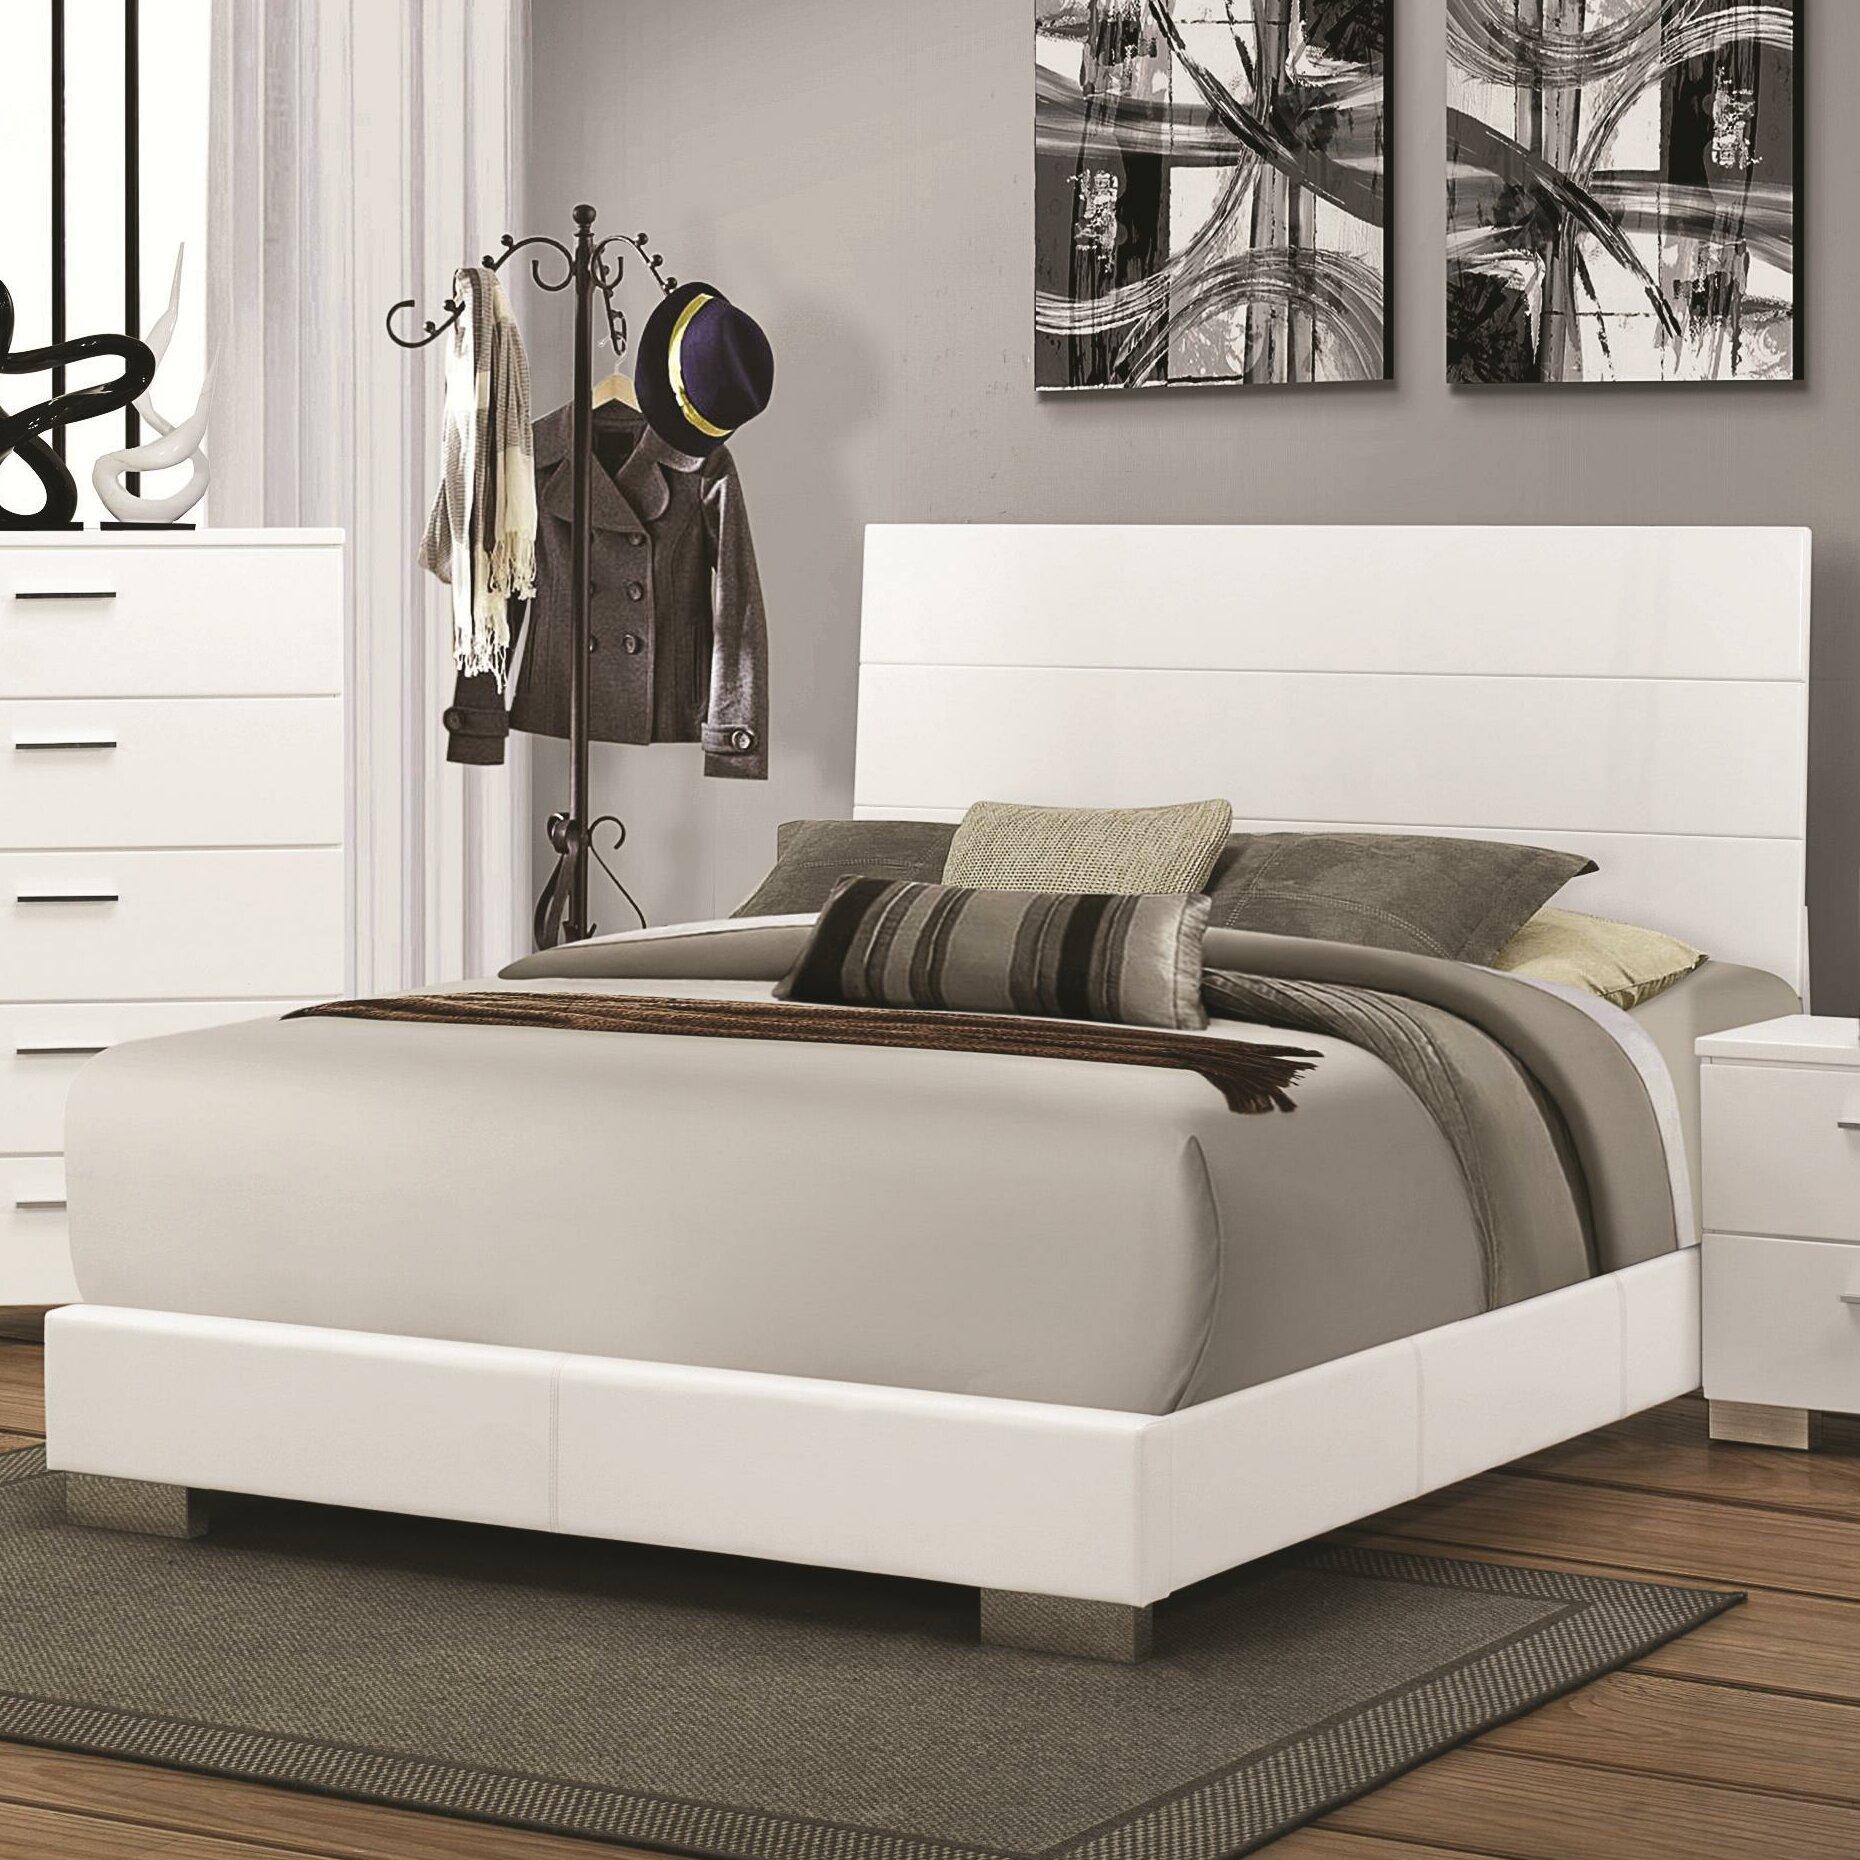 Wildon Home Panel Bed Reviews Wayfair